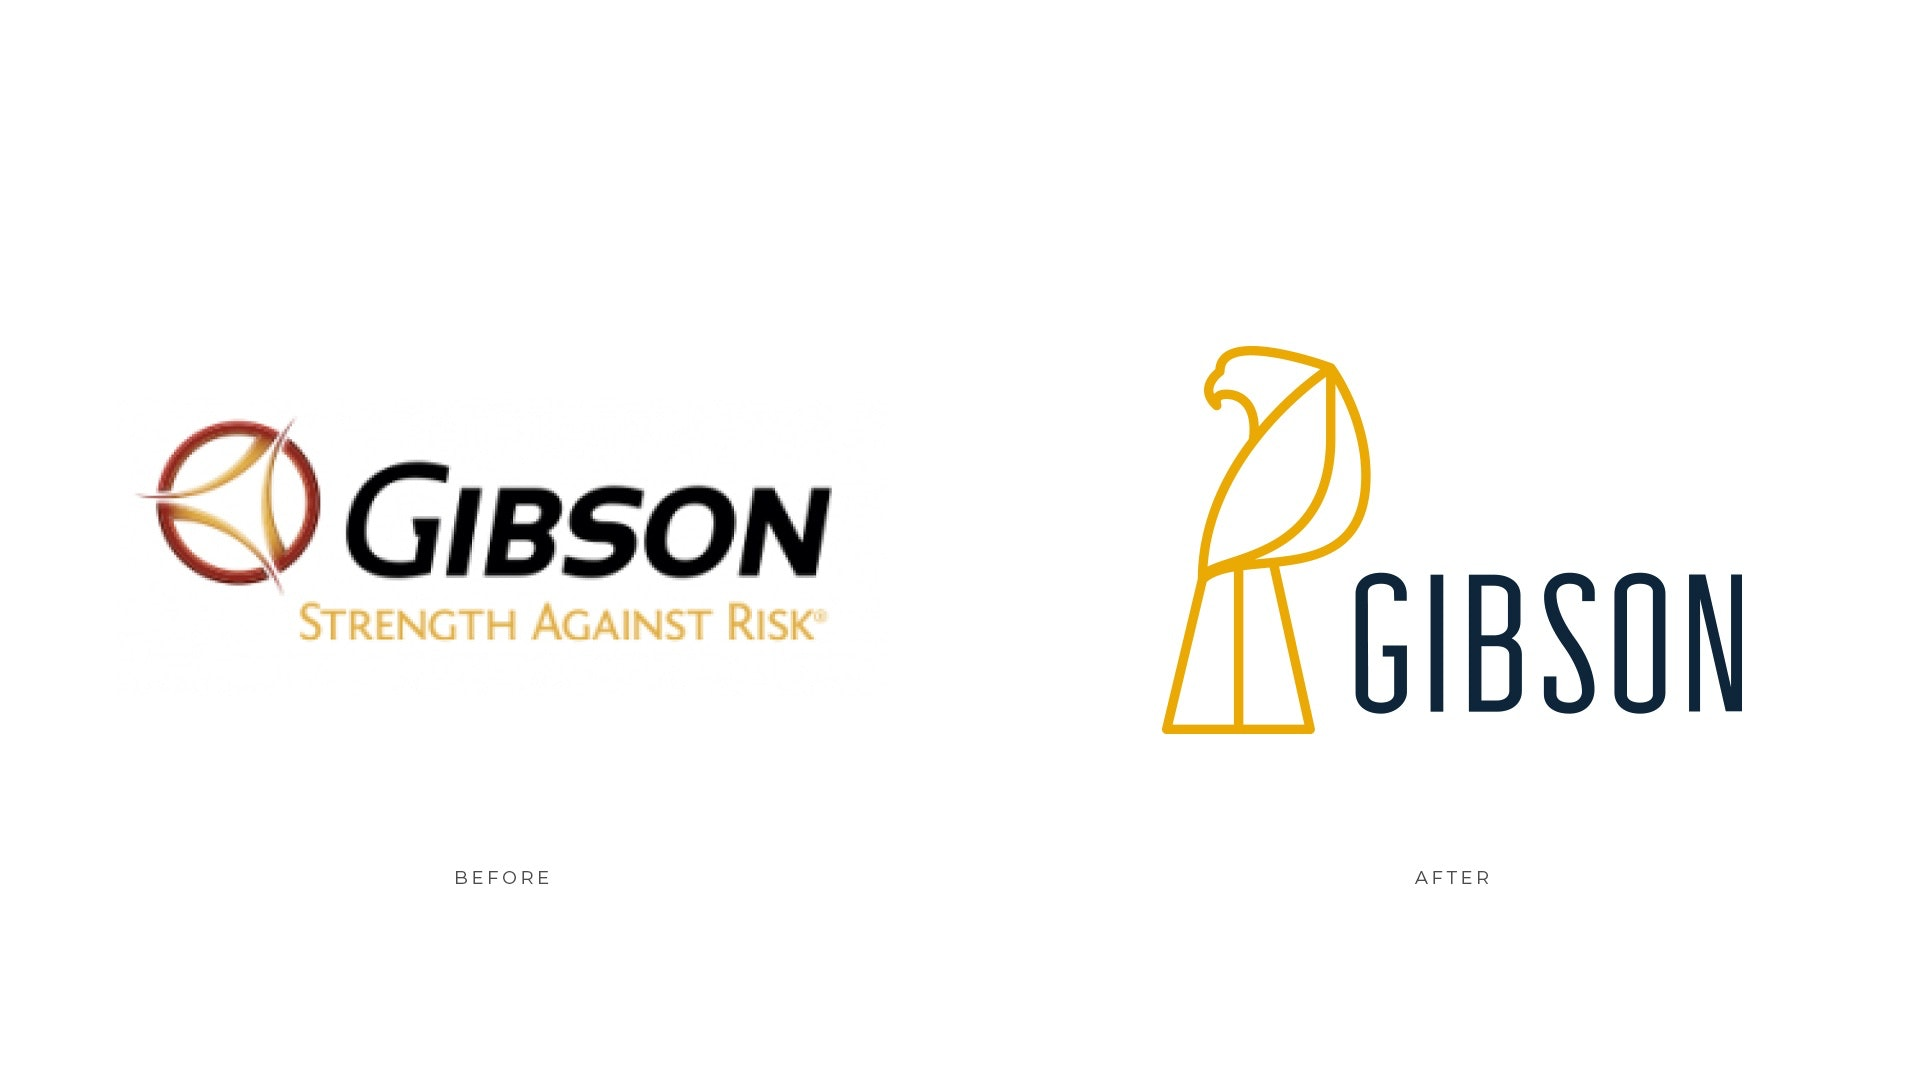 Gibson Rebrand Logo